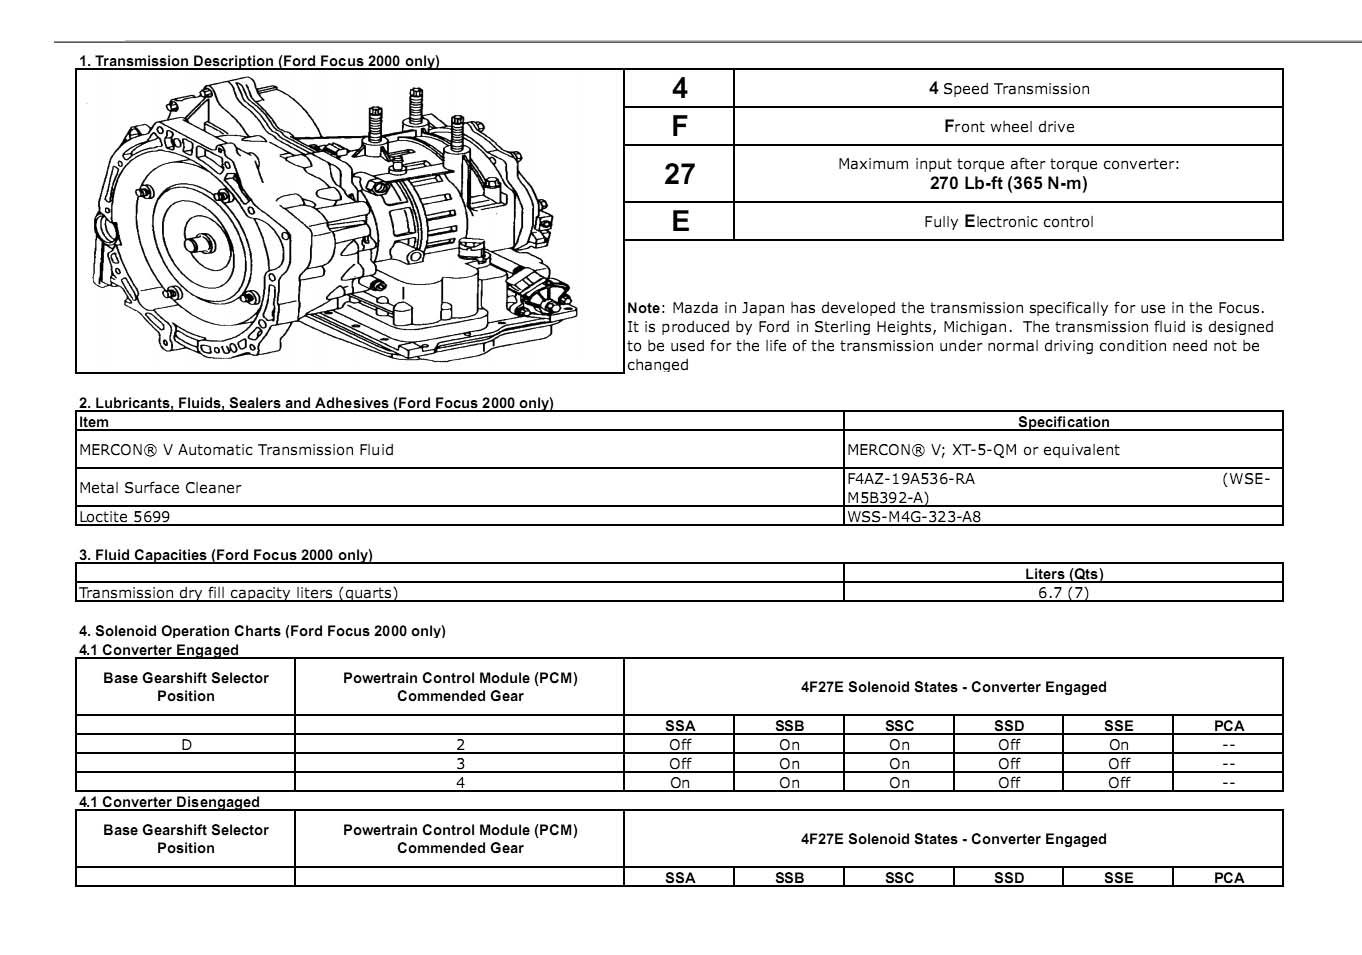 маркировка масел дла автоматических коробок ford